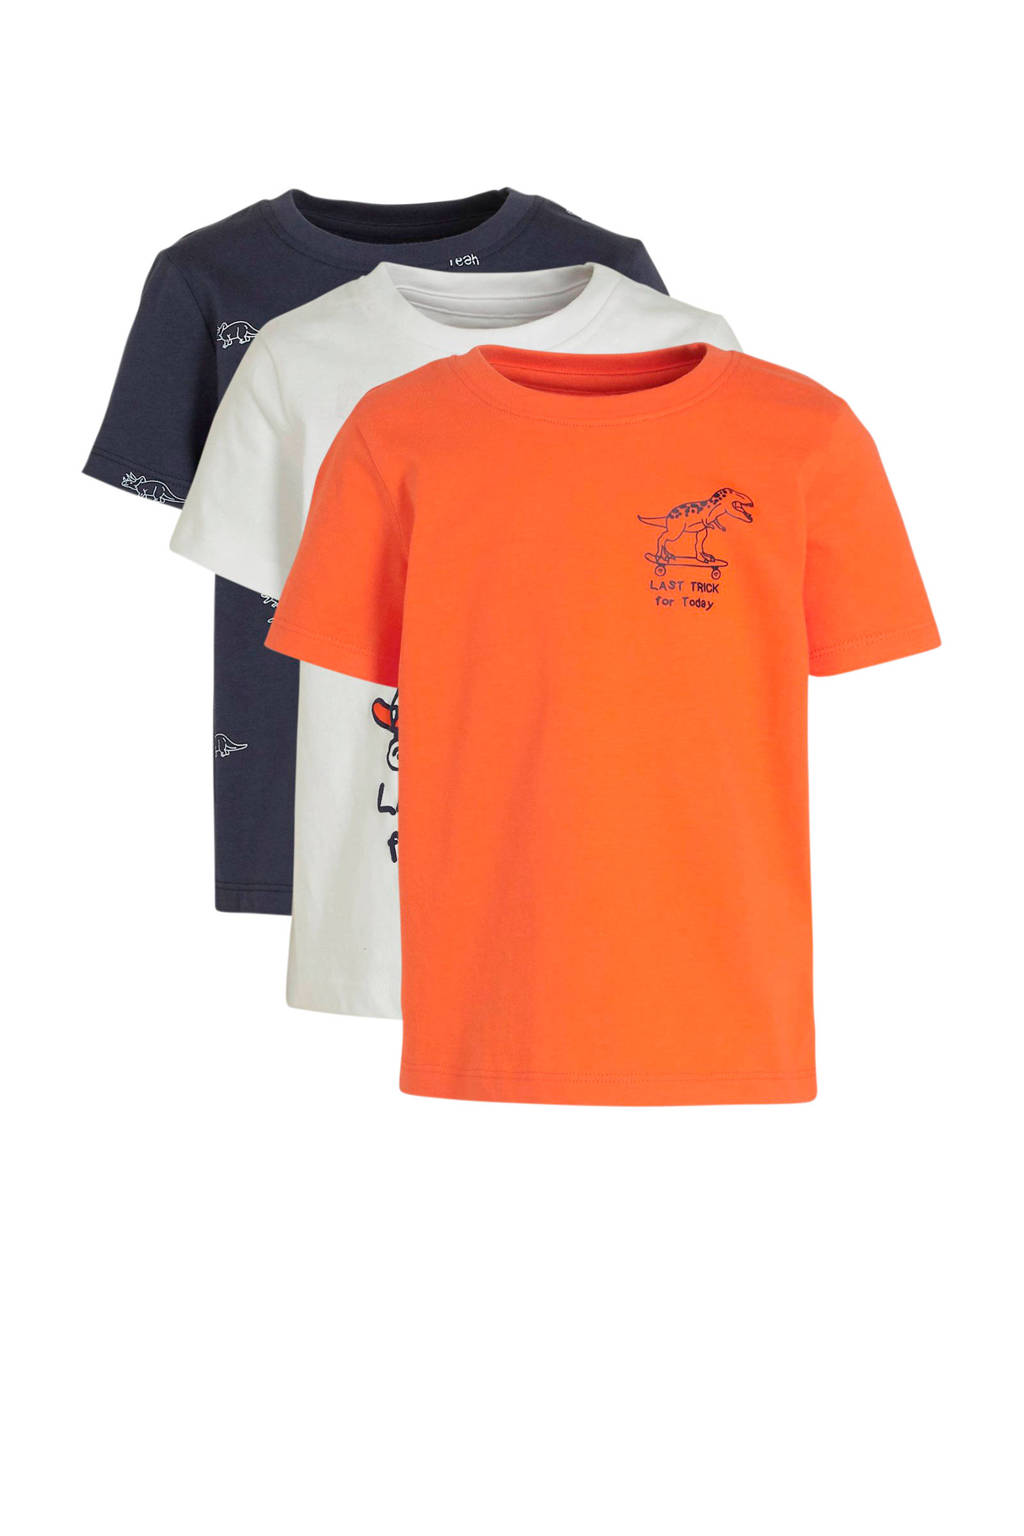 C&A Palomino T-shirt met printopdruk - set van 3 wit/oranje/donkerblauw, Wit/Oranje/Donkerblauw